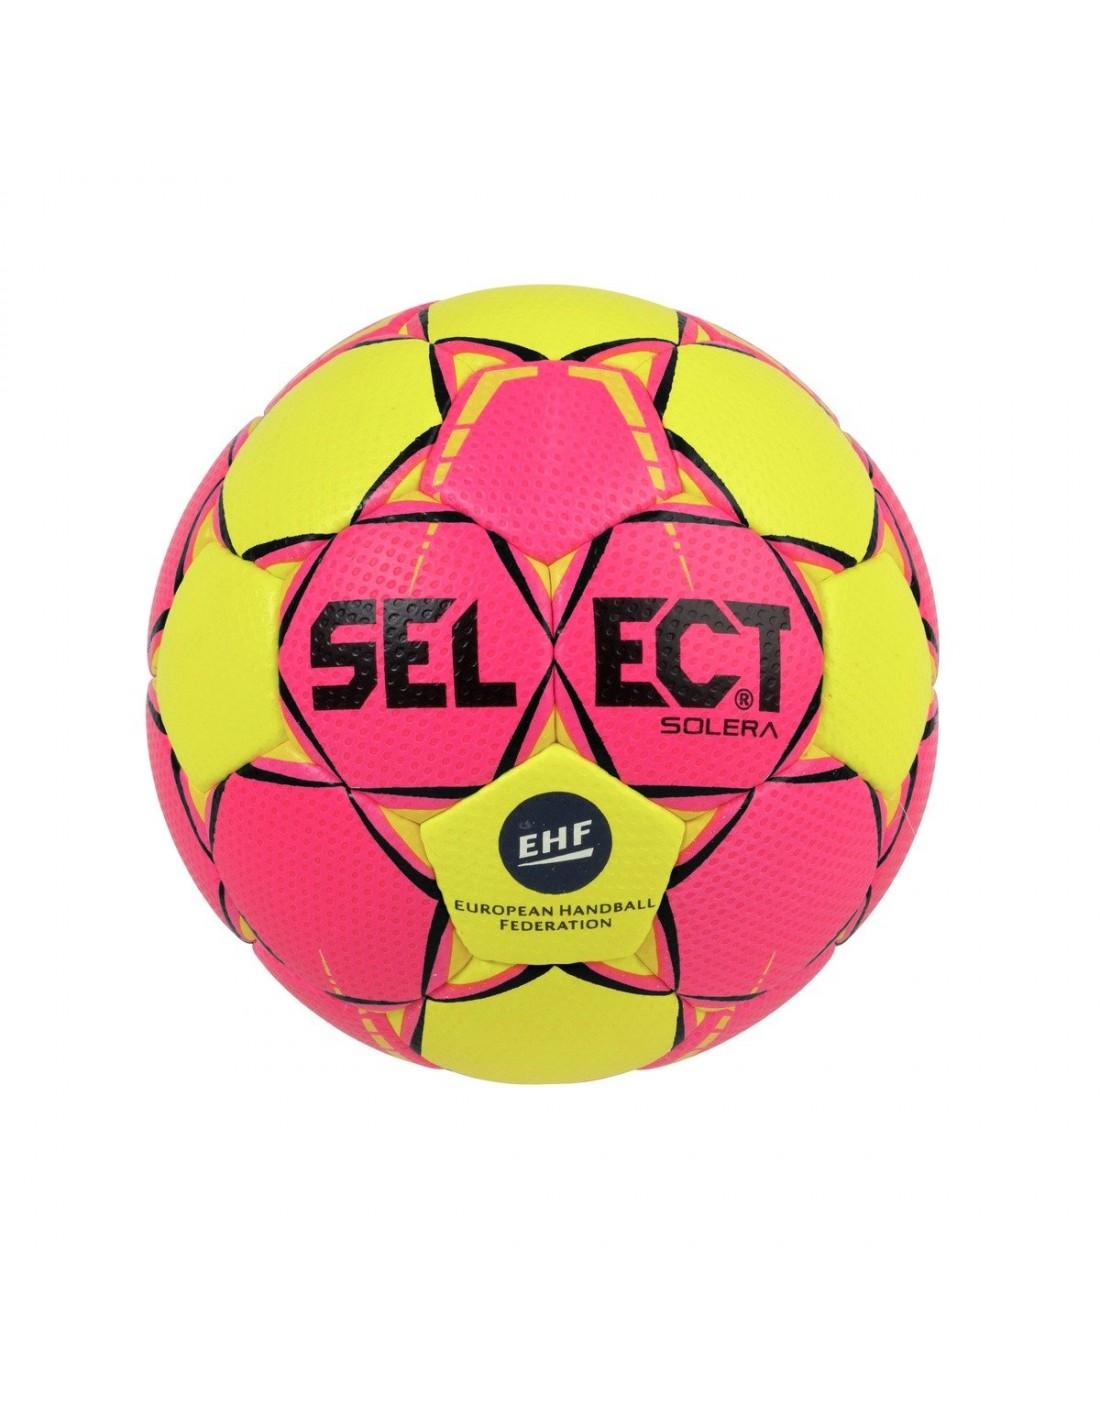 254b534f håndball select solera available via PricePi.com. Shop the entire ...